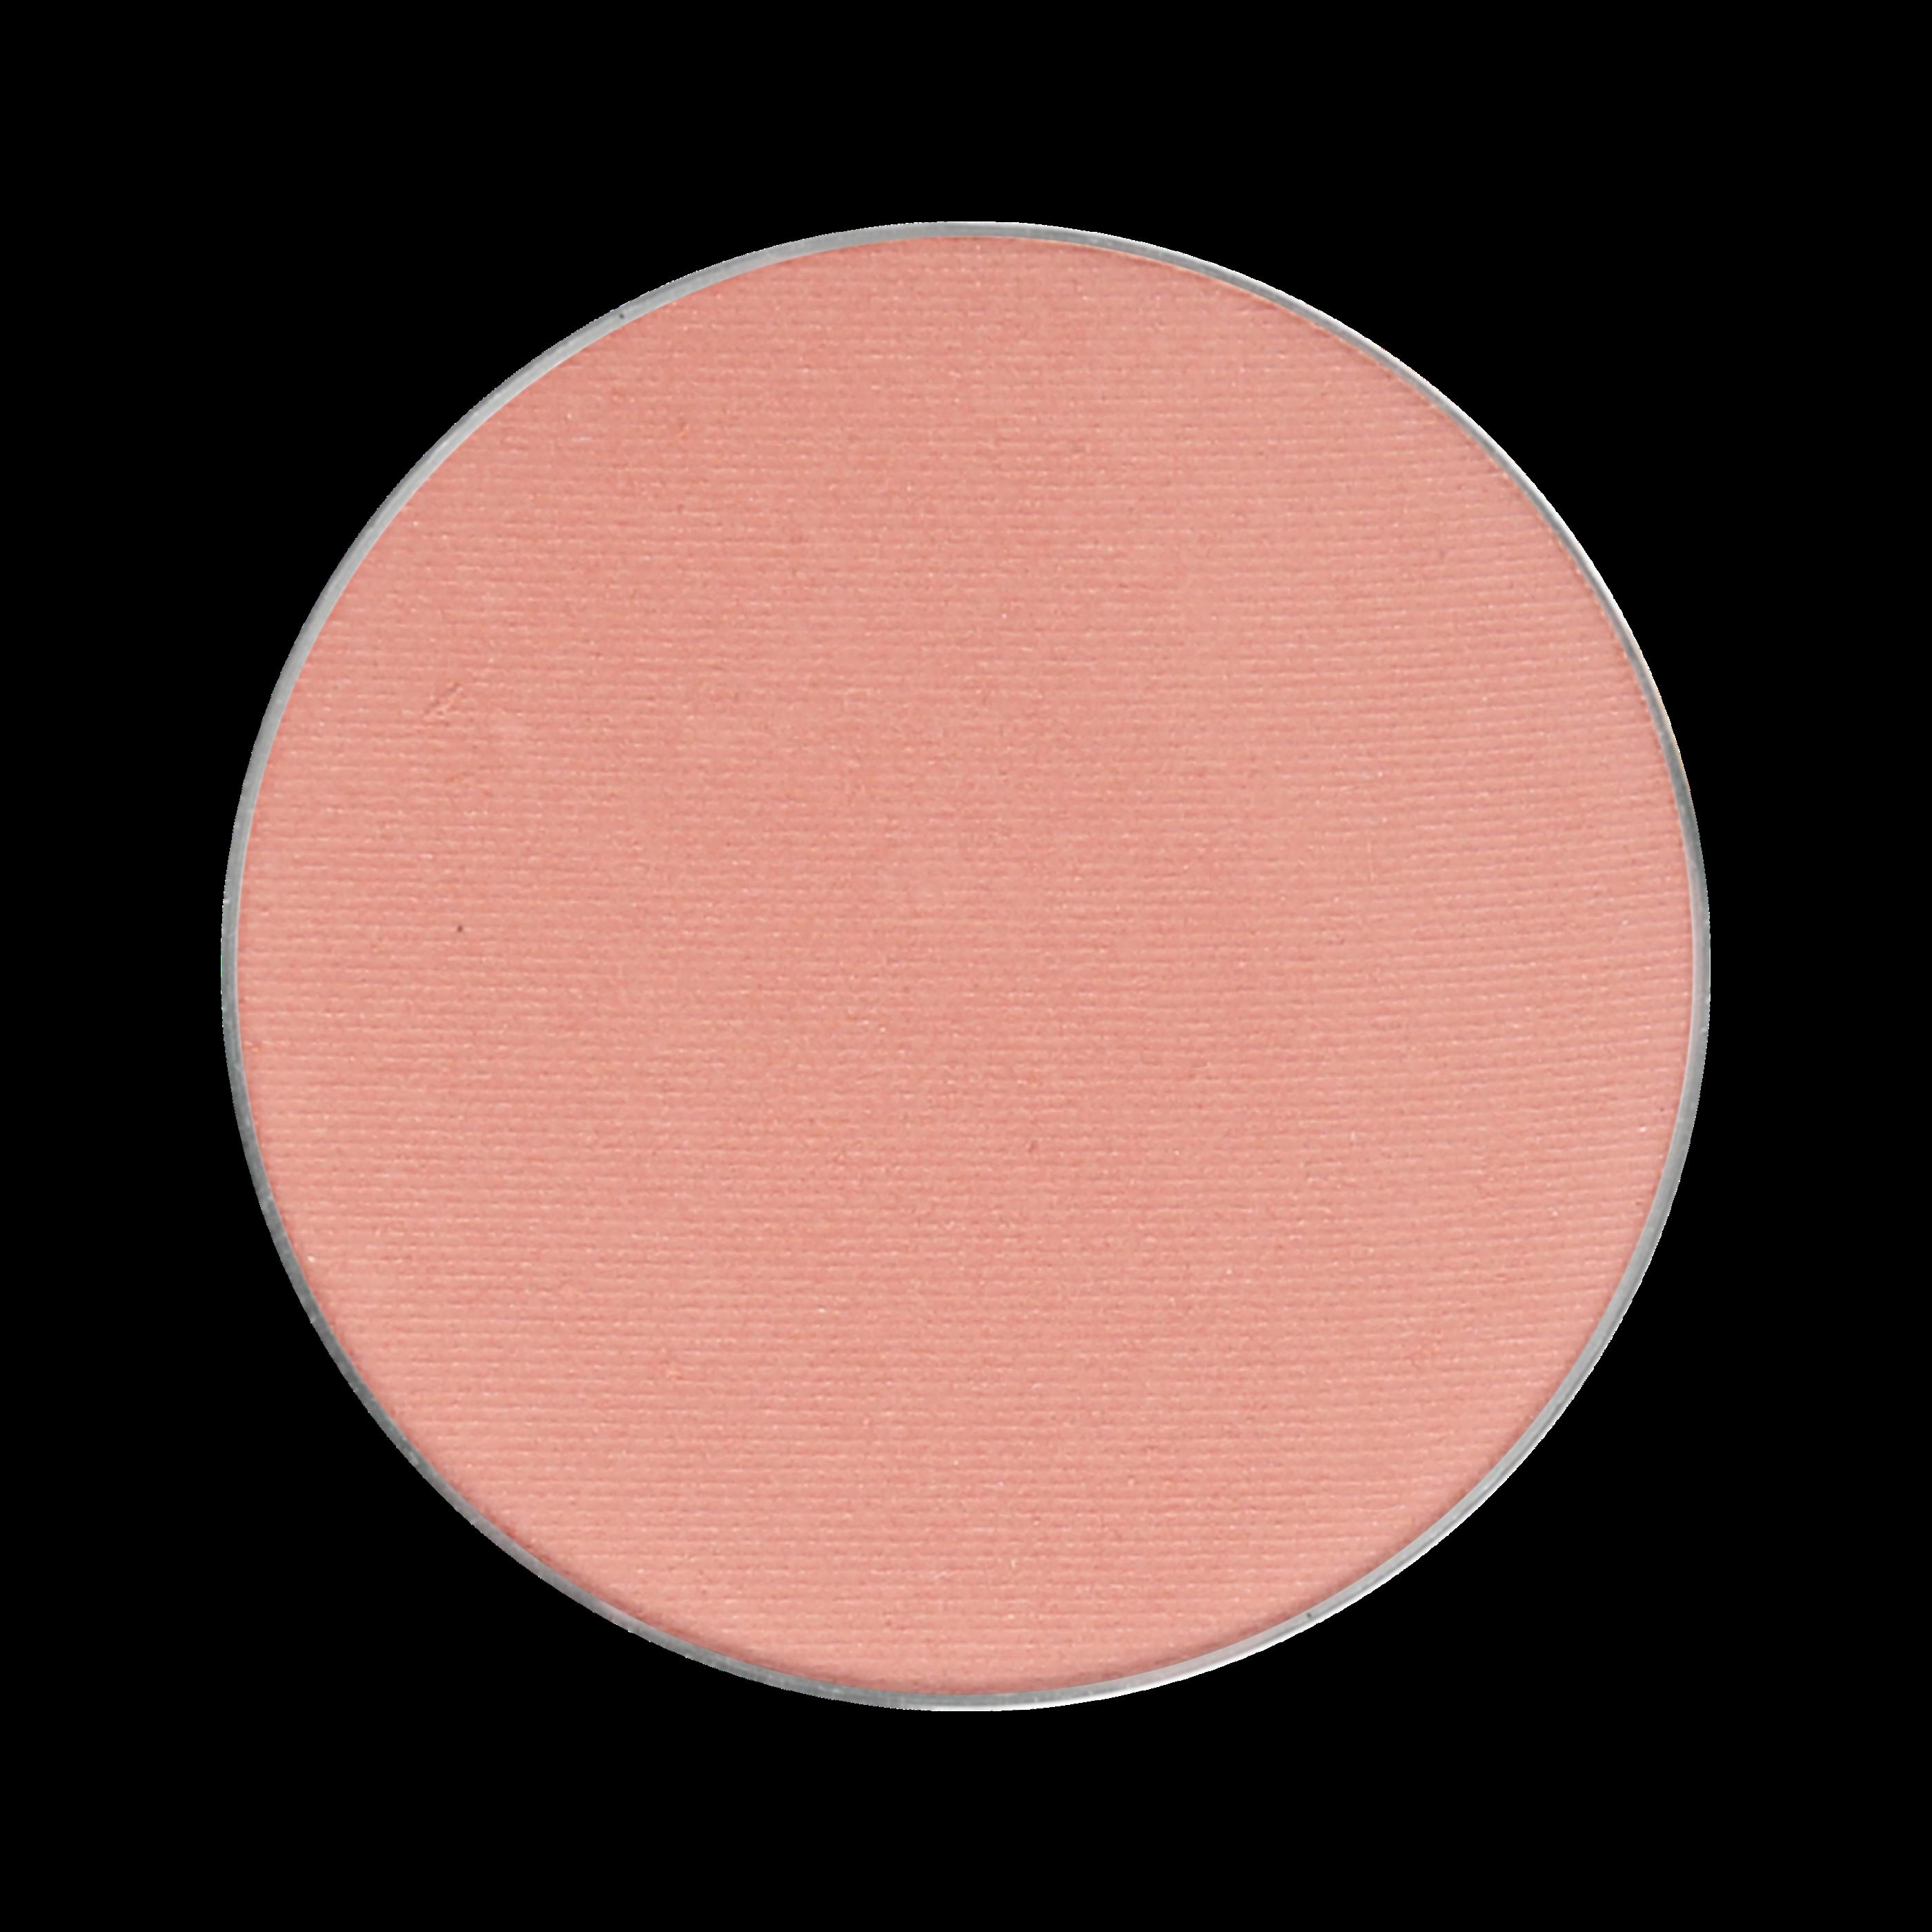 Blush Spring Magnetic Refill